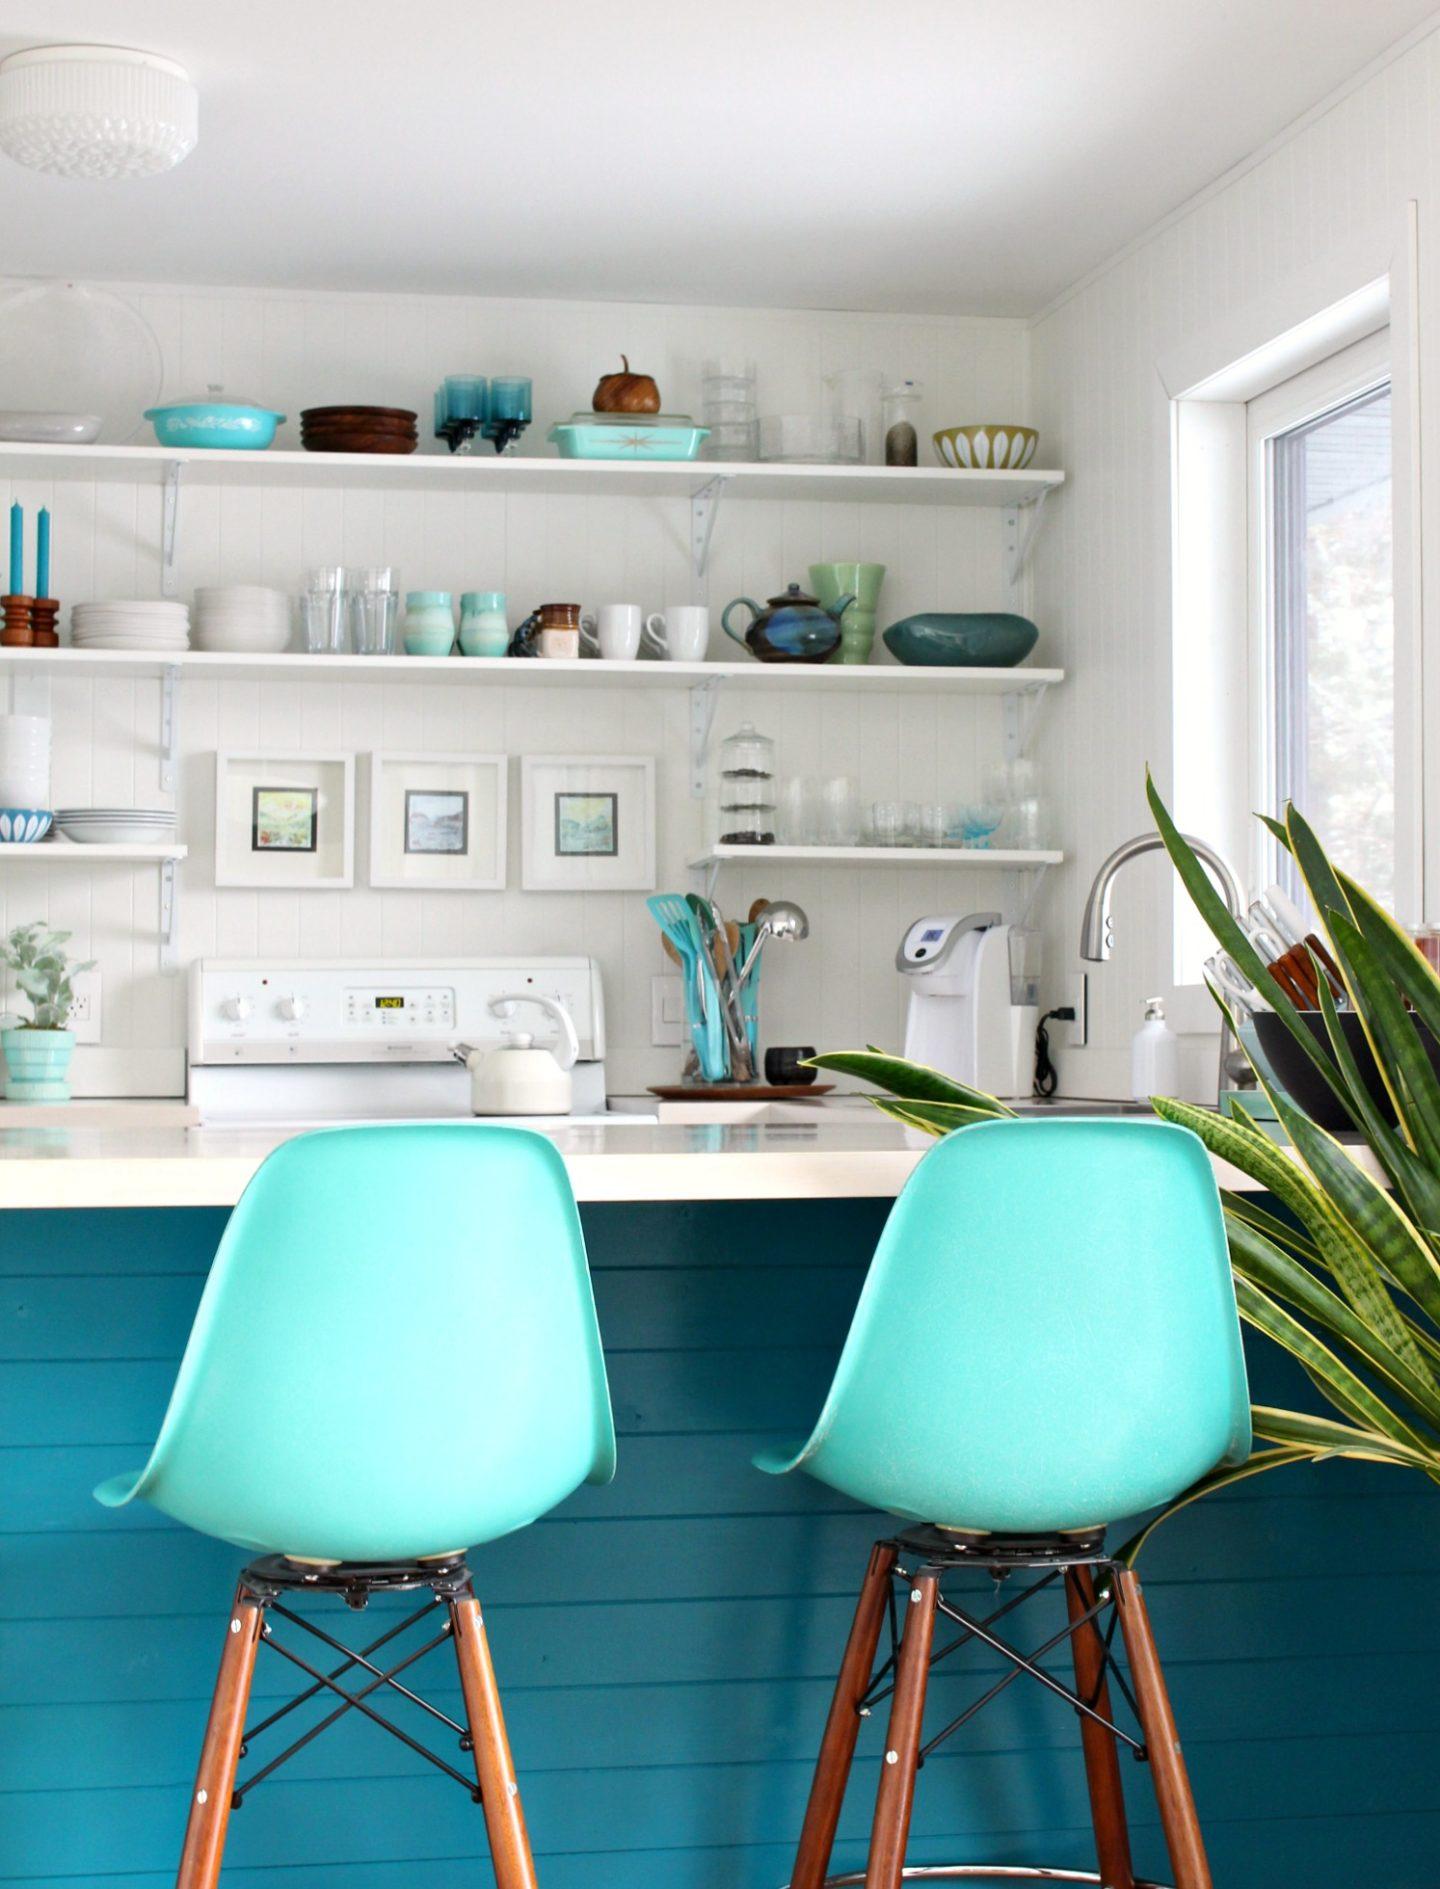 Modern Paneling Idea: Add to Kitchen Cabinet Backs